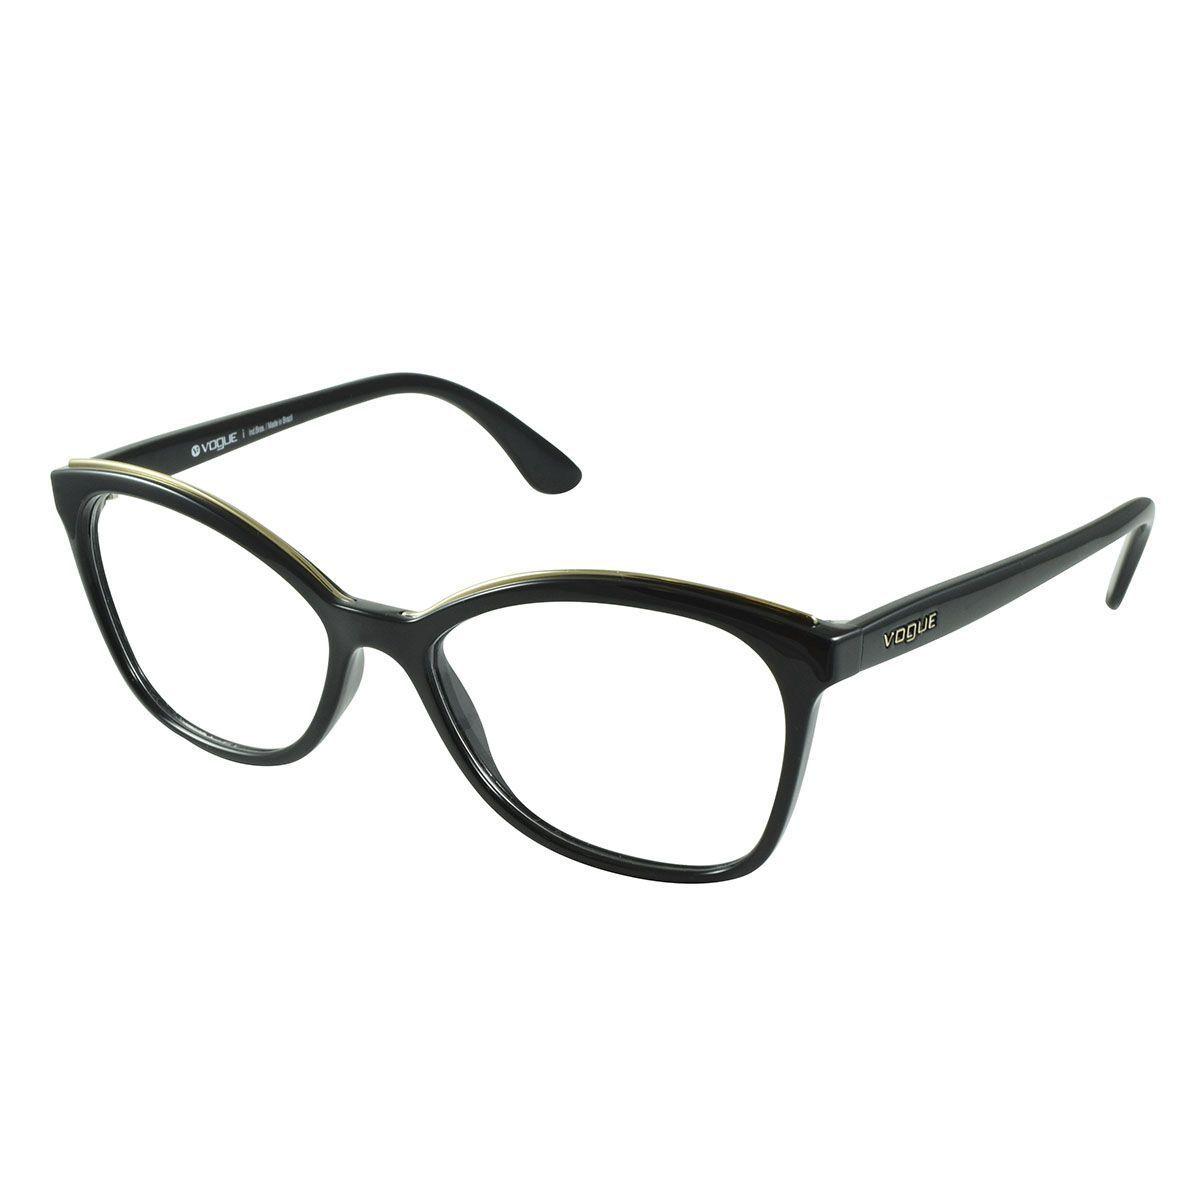 43977244bc803 Óculos de Grau Vogue VO5160L-W44 54